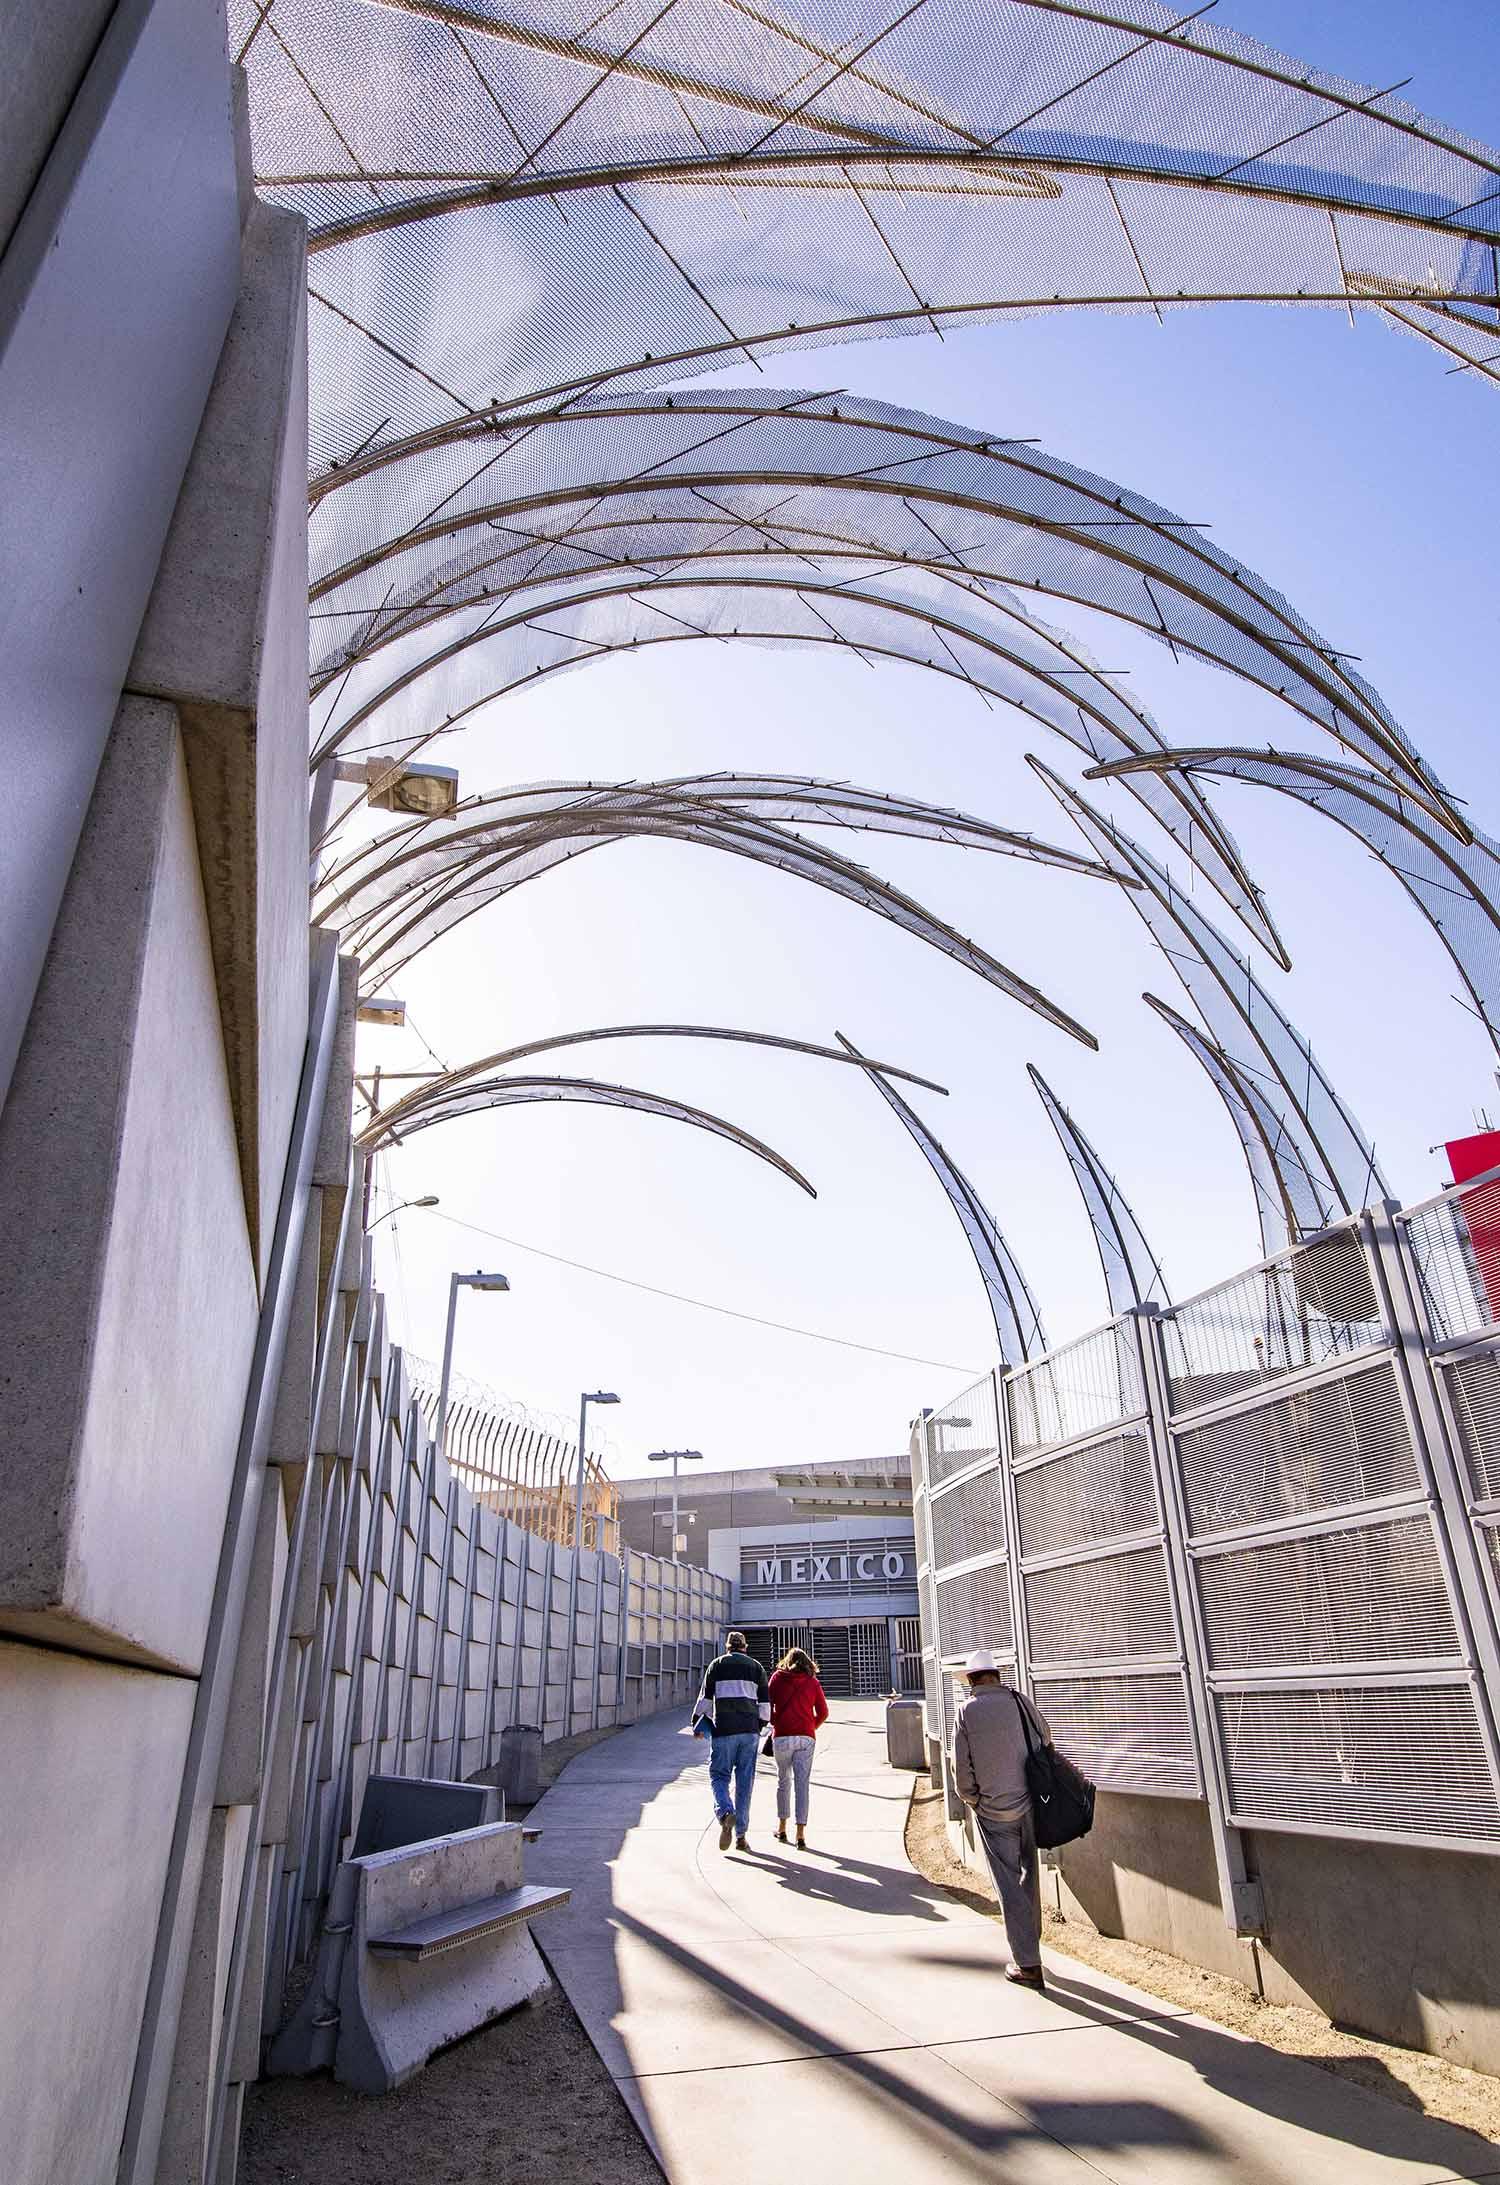 San-Ysidro-border-walls-decorative-barbed-wire-pedestrians.jpg